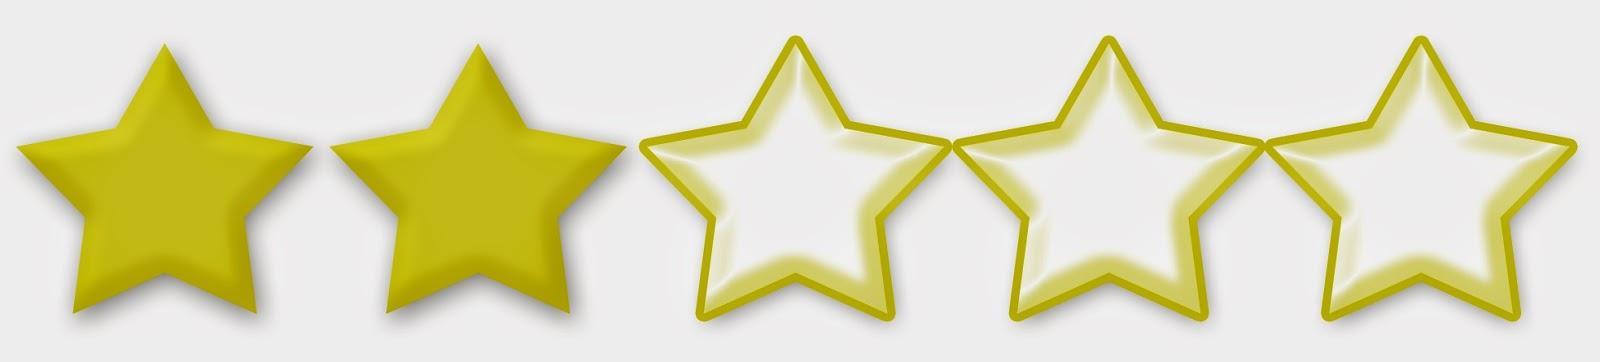 2Stars.jpg